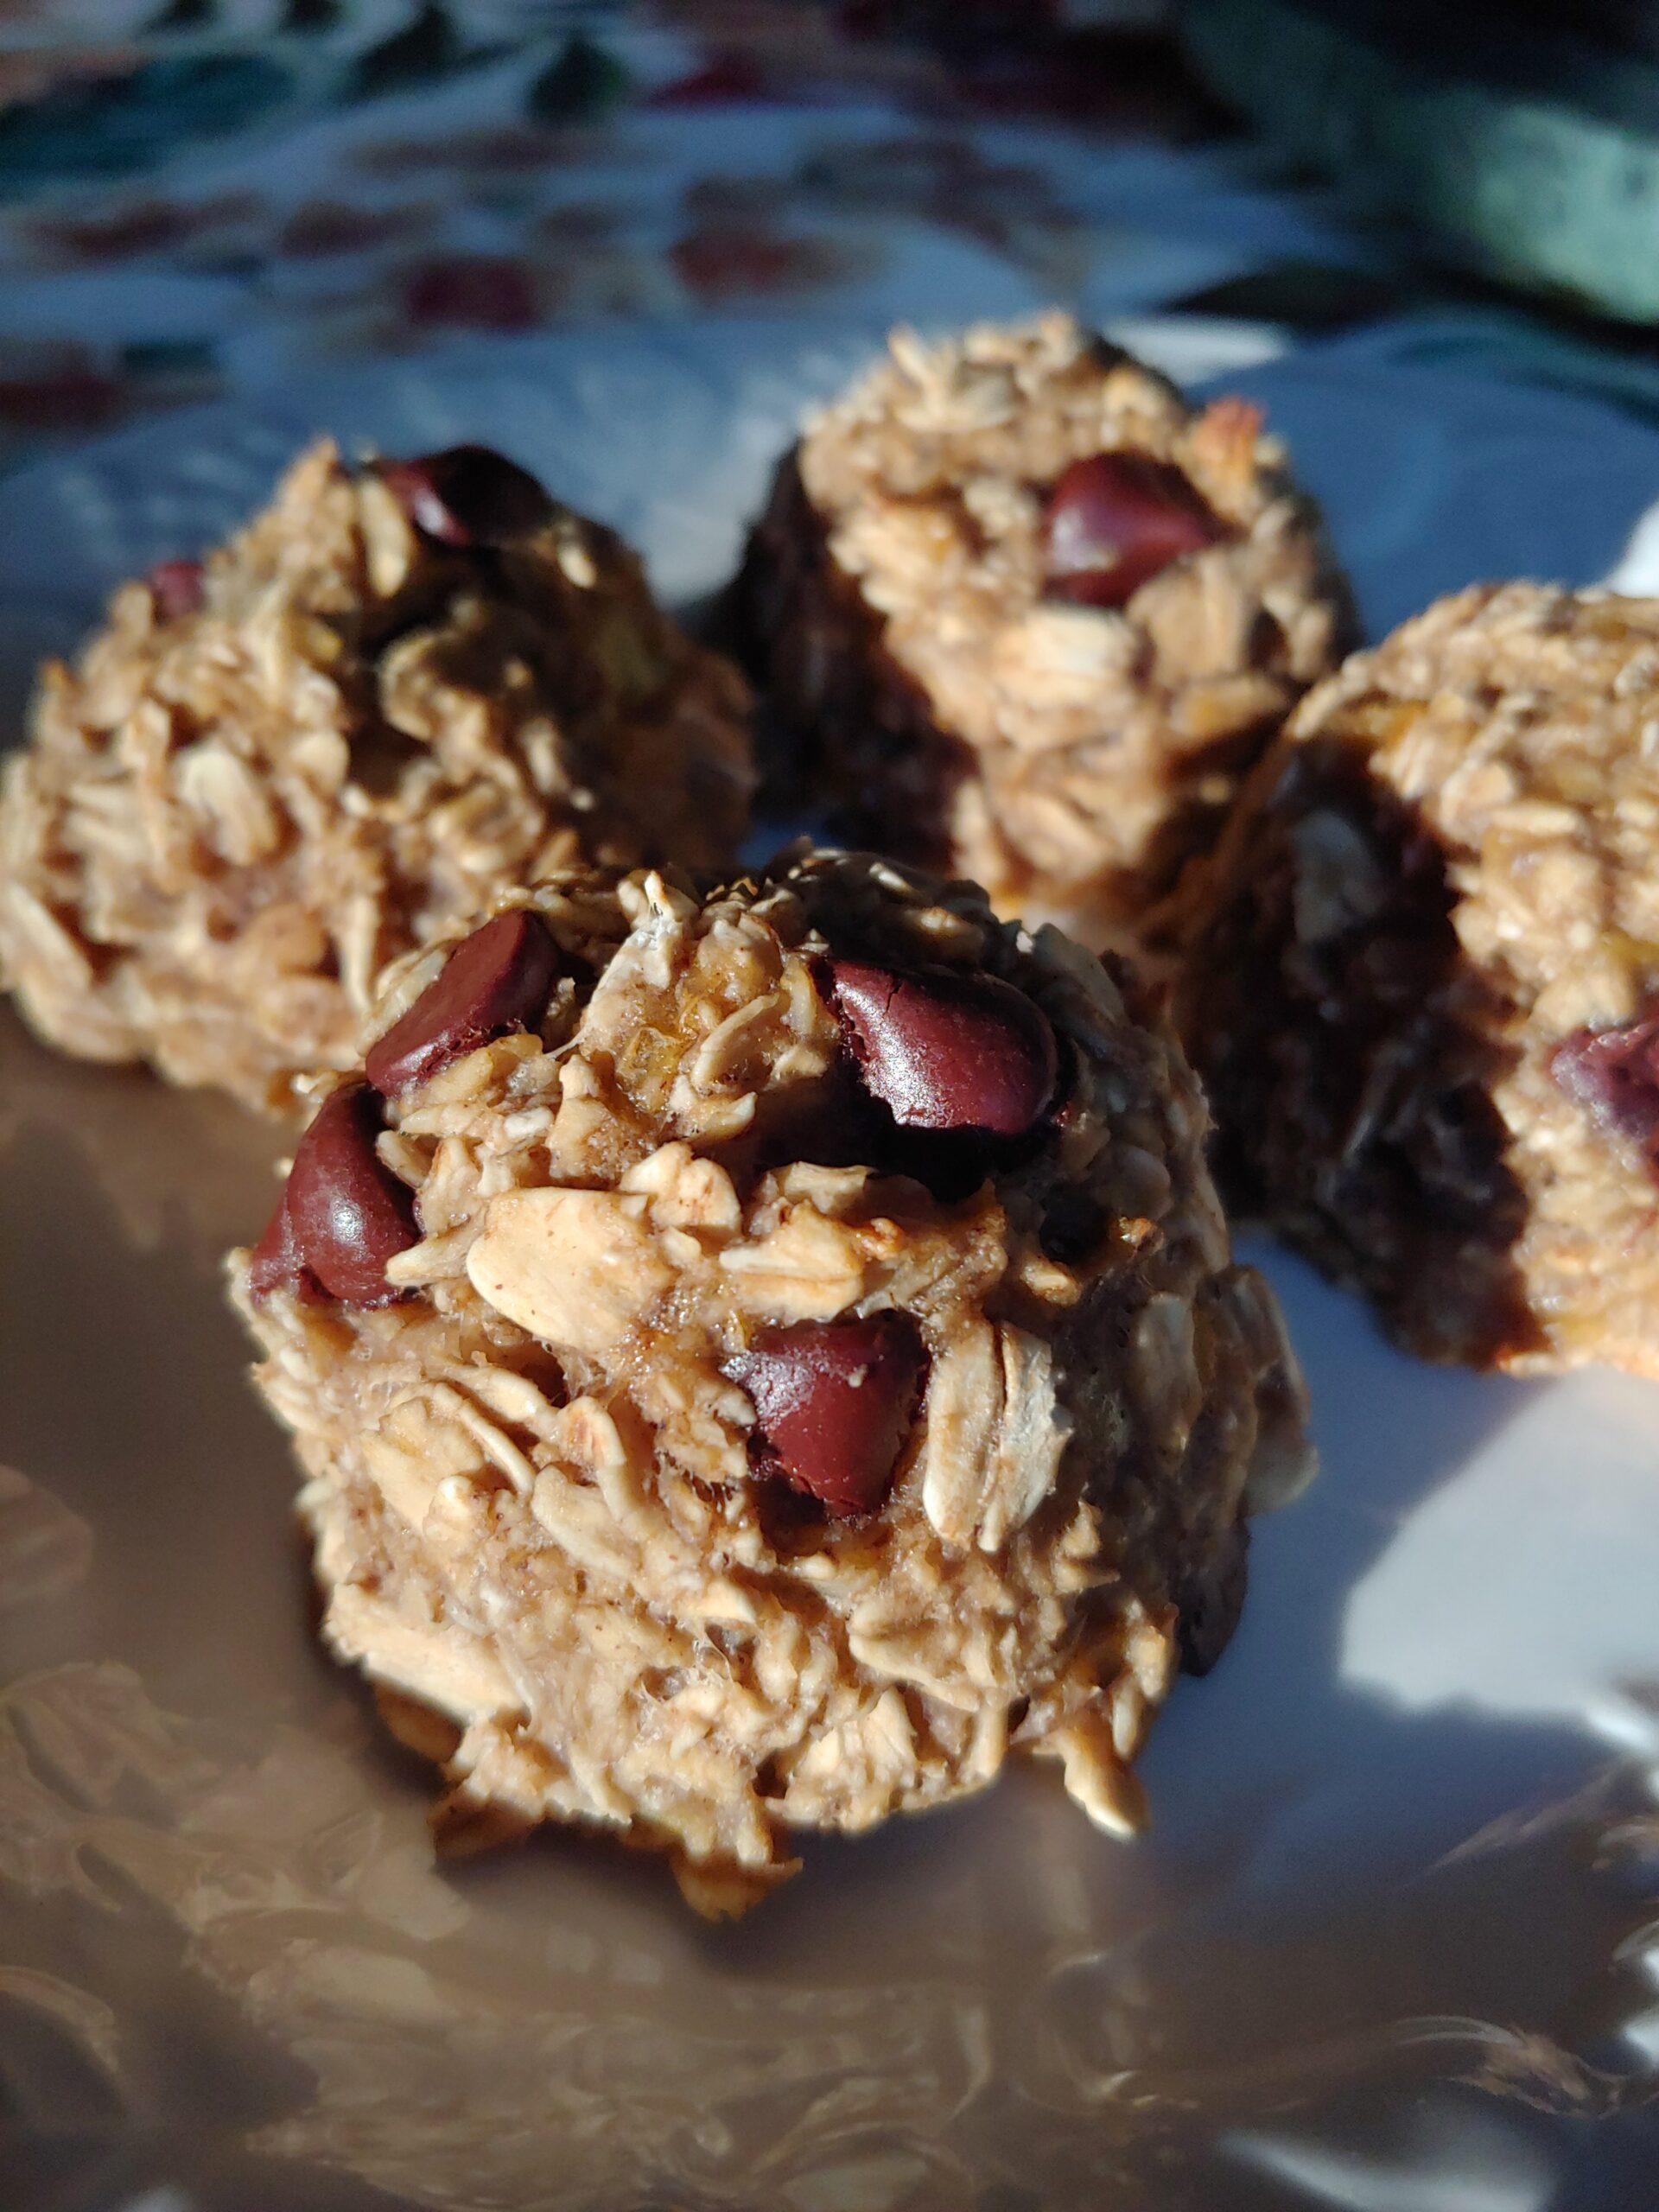 Vegan Gluten-Free Hemp Chocolate Chip Oatmeal Banana Cookie Mounds